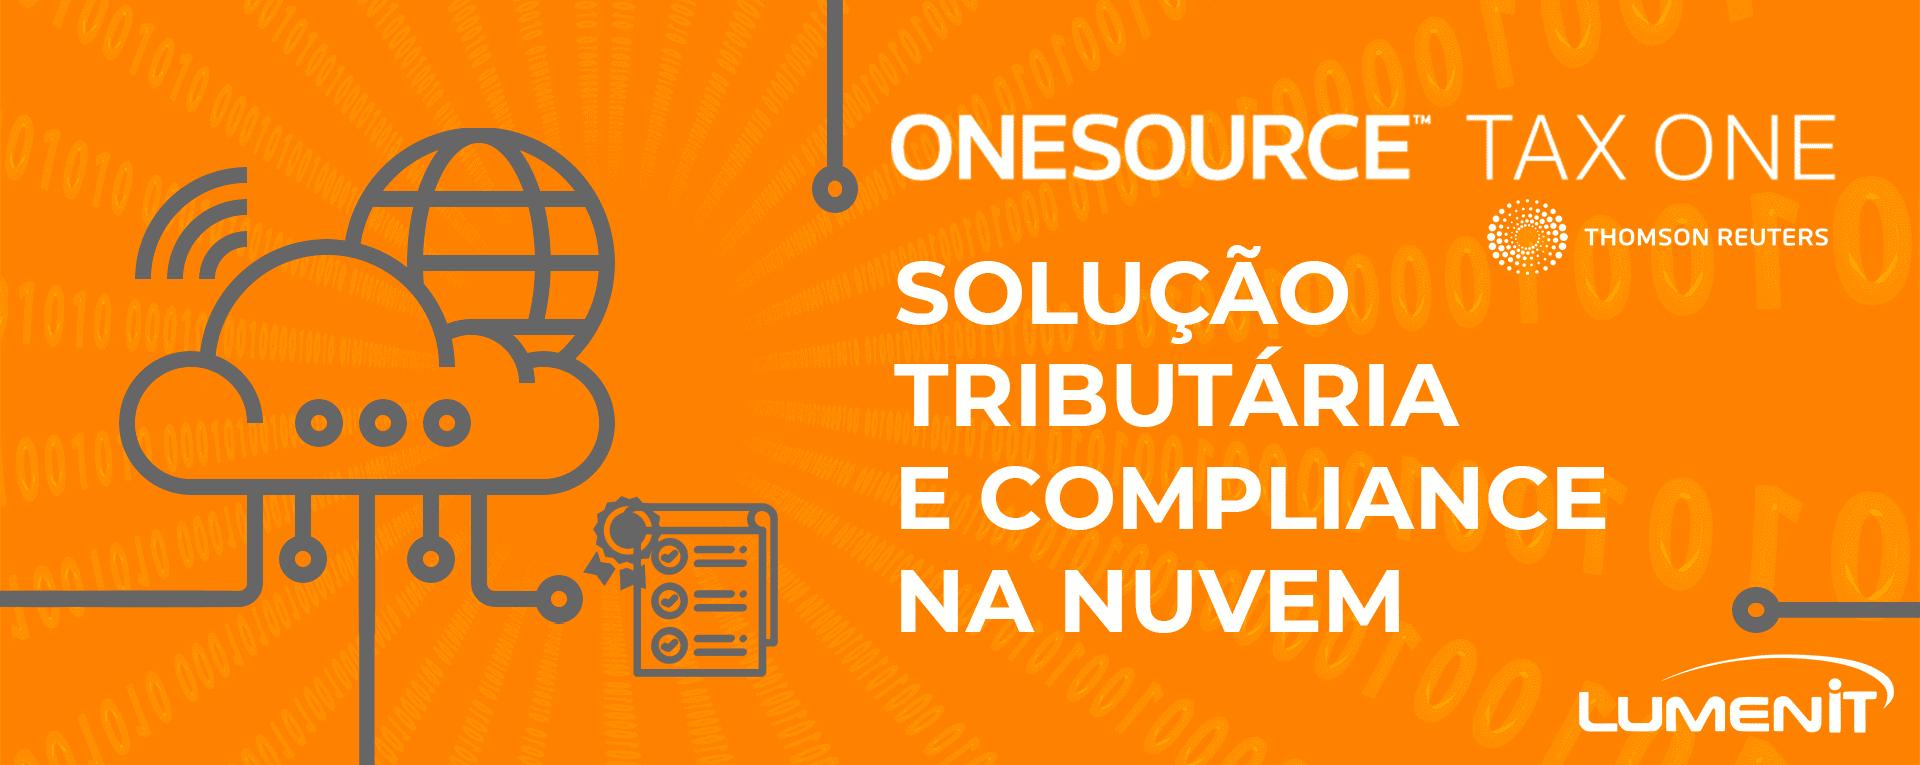 Onesource TAX ONE - Segurança em Cloud, certeza em Compliance!